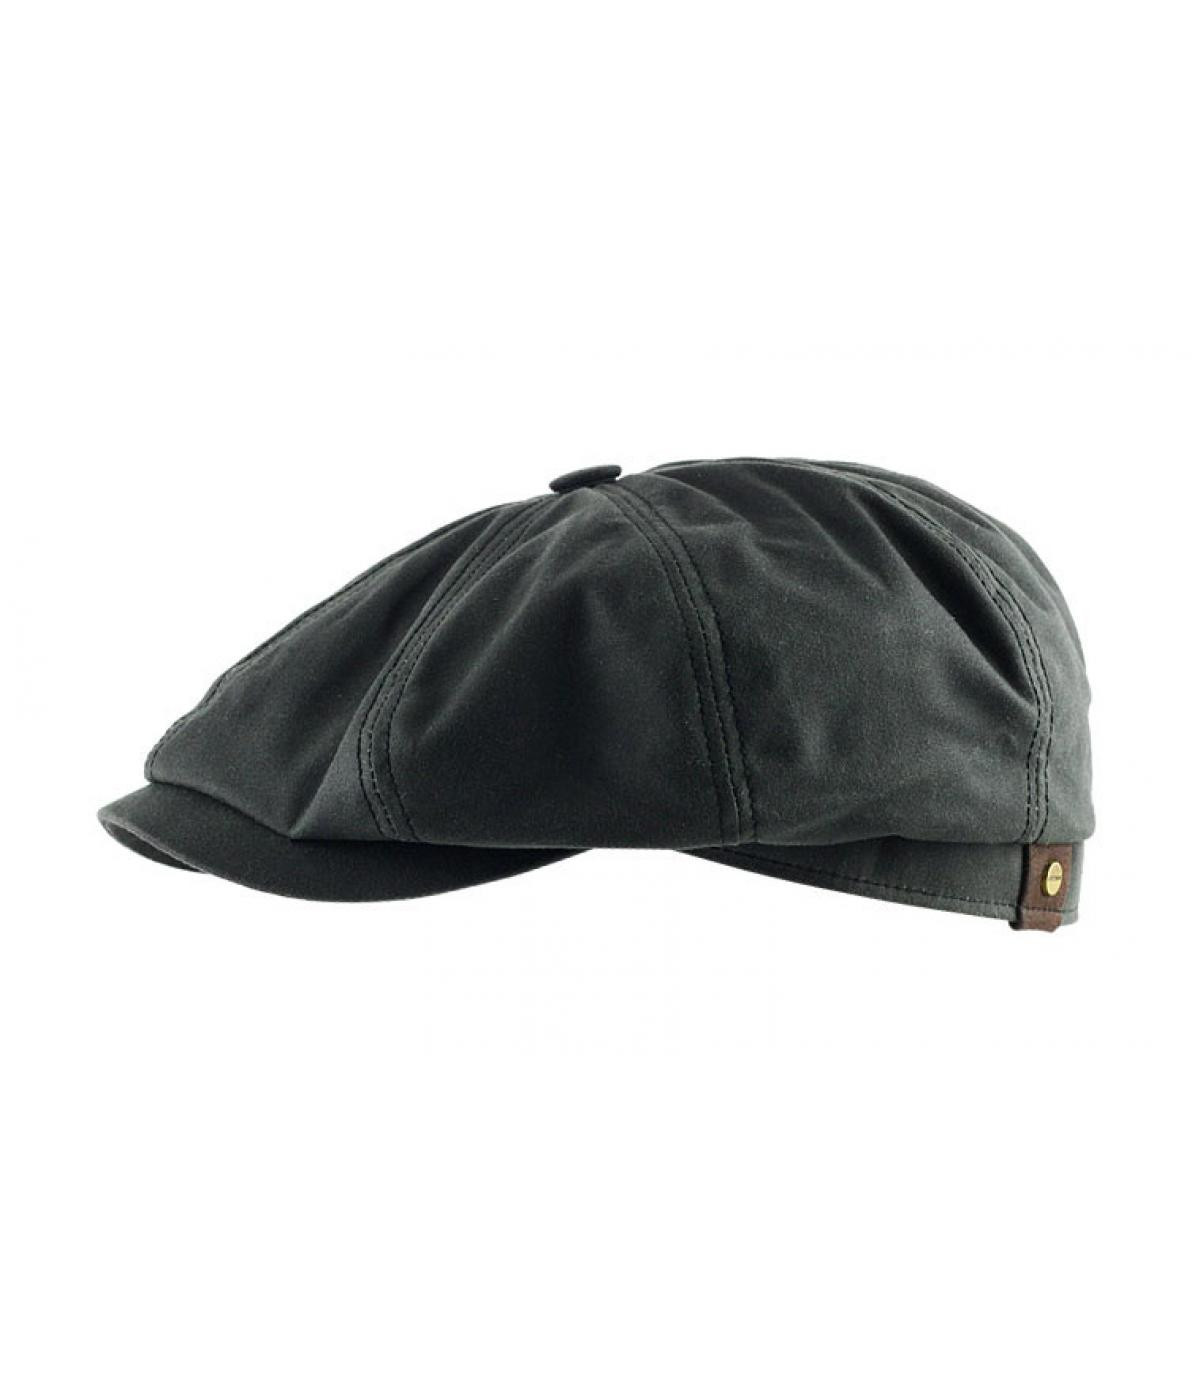 Gorra Hatteras negro